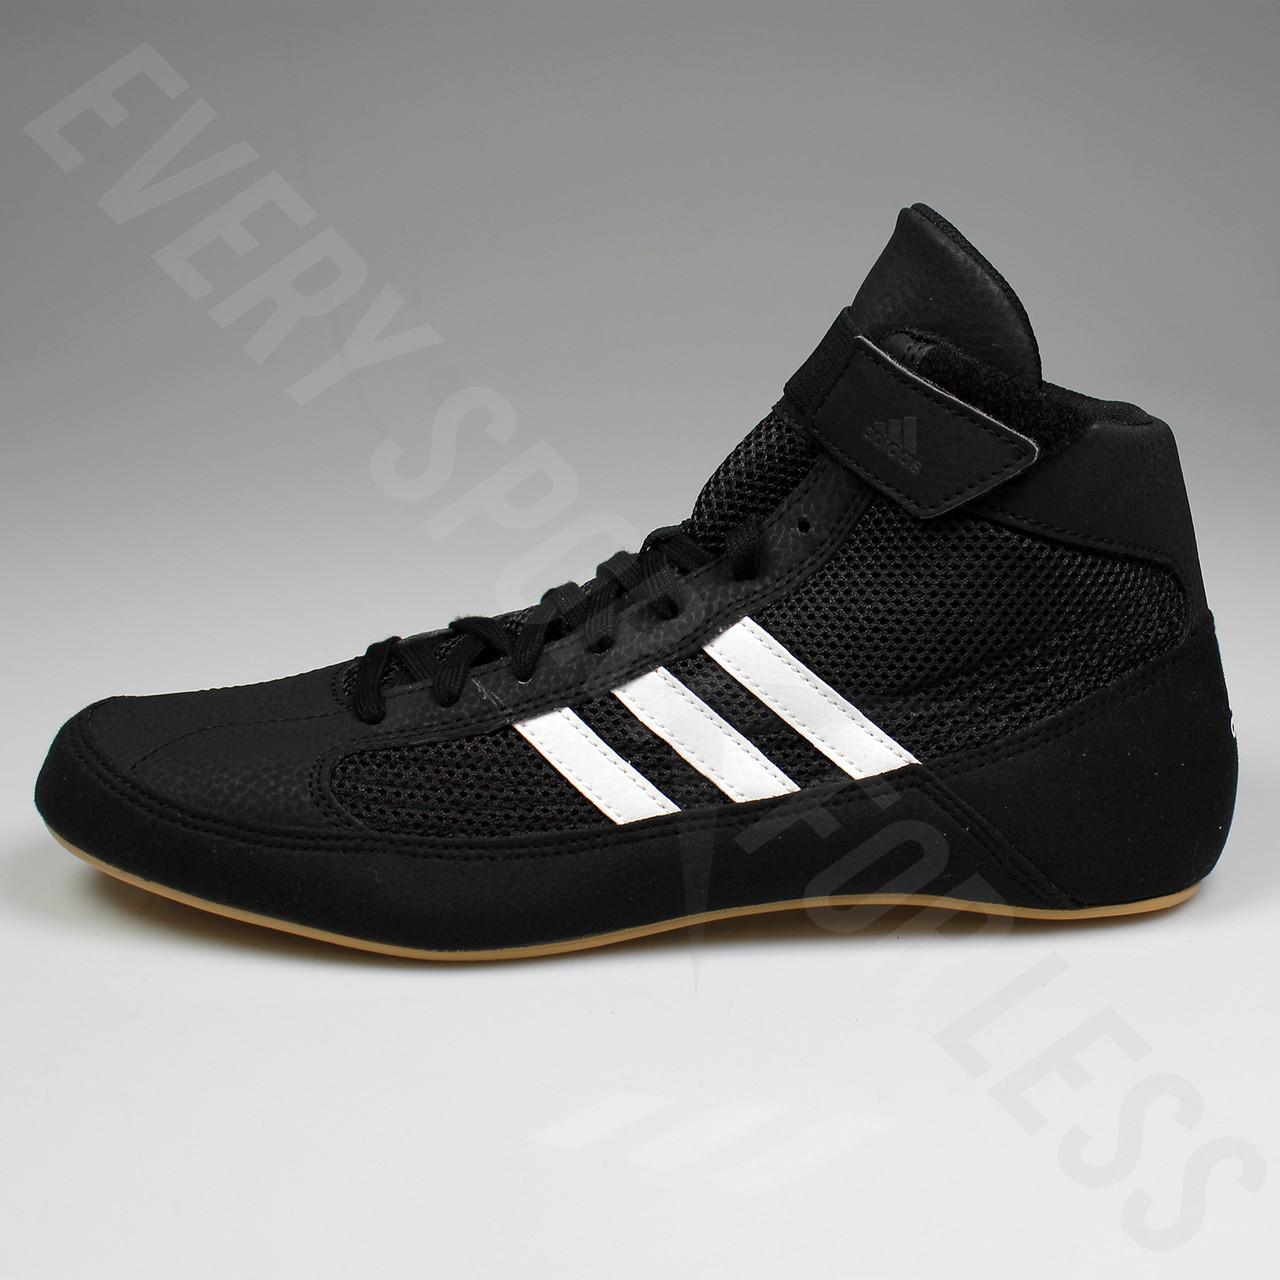 Adidas HVC Men Wrestling Shoes Black White Gum